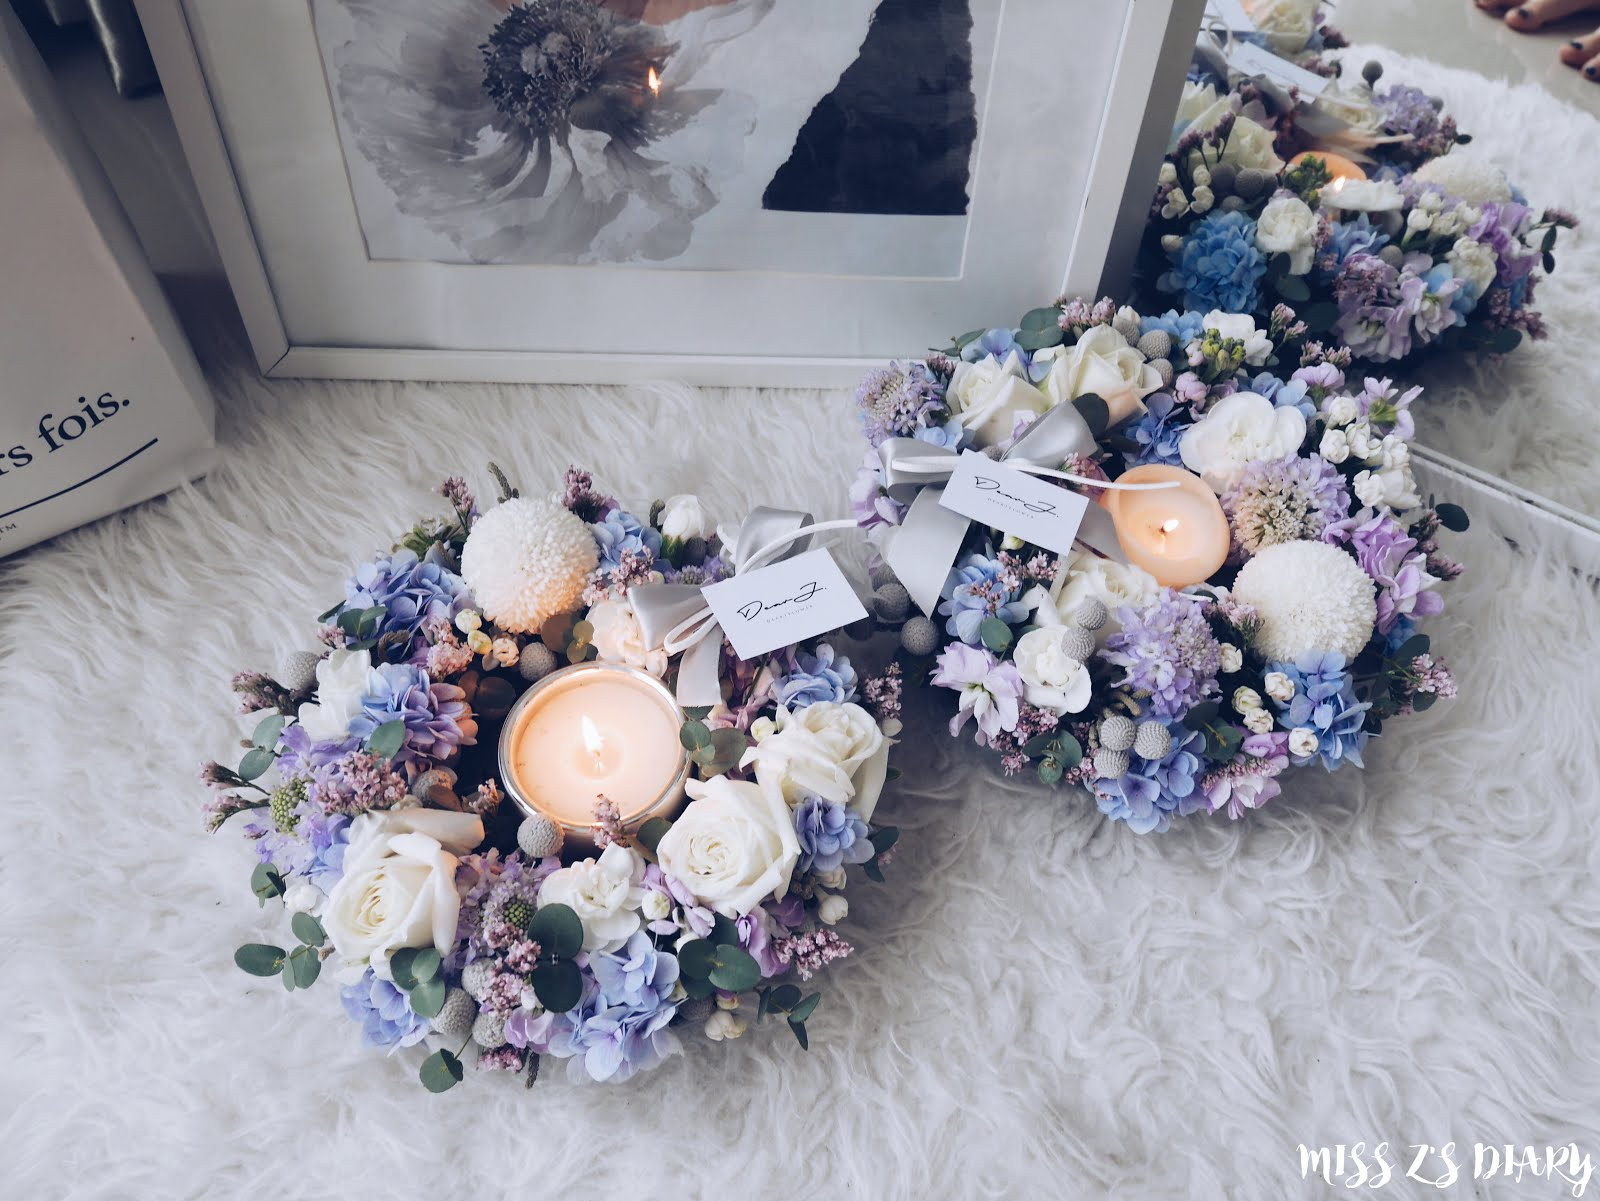 Ms Zs Diary Floral Workshop Kl Dear J Hobby Class